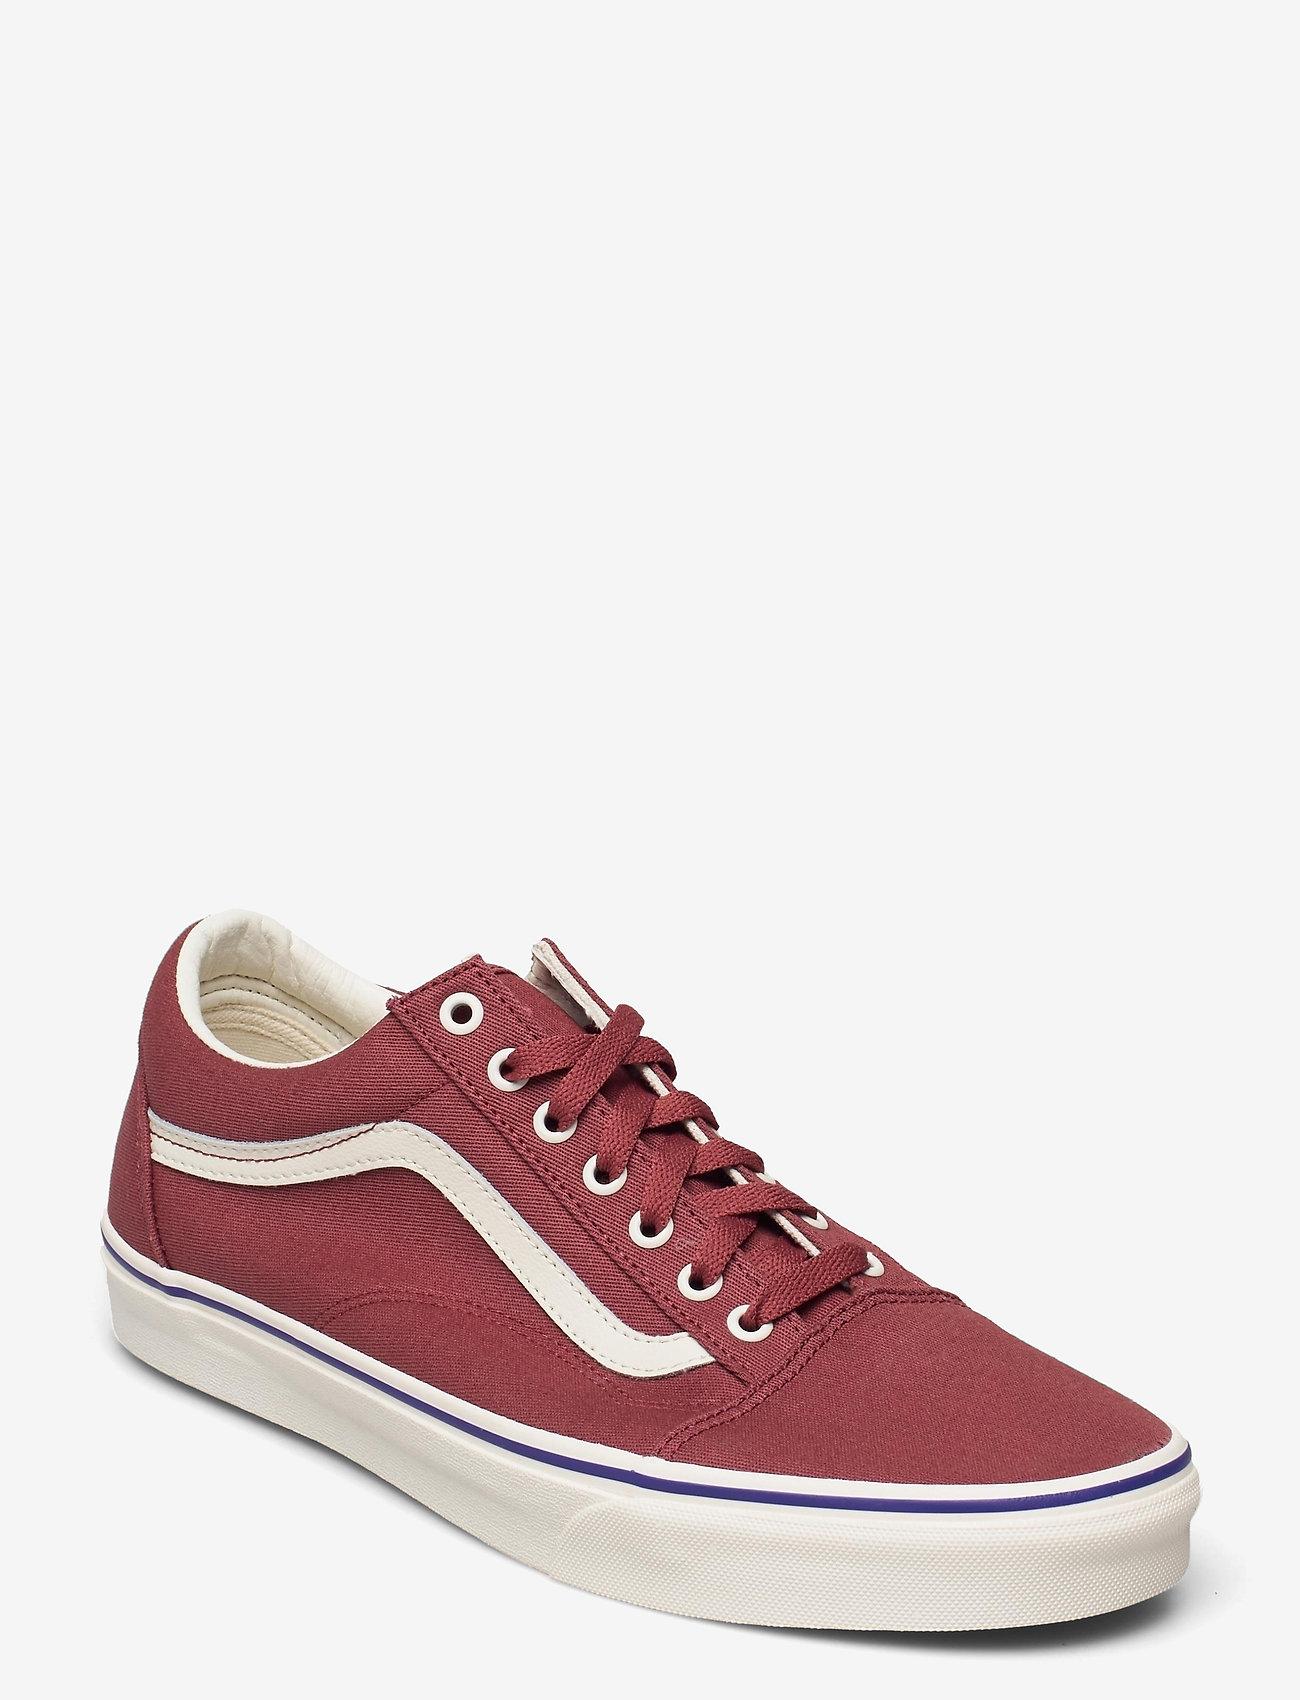 VANS - UA Old Skool - laag sneakers - (retro cali)mrslaspctrmbl - 0